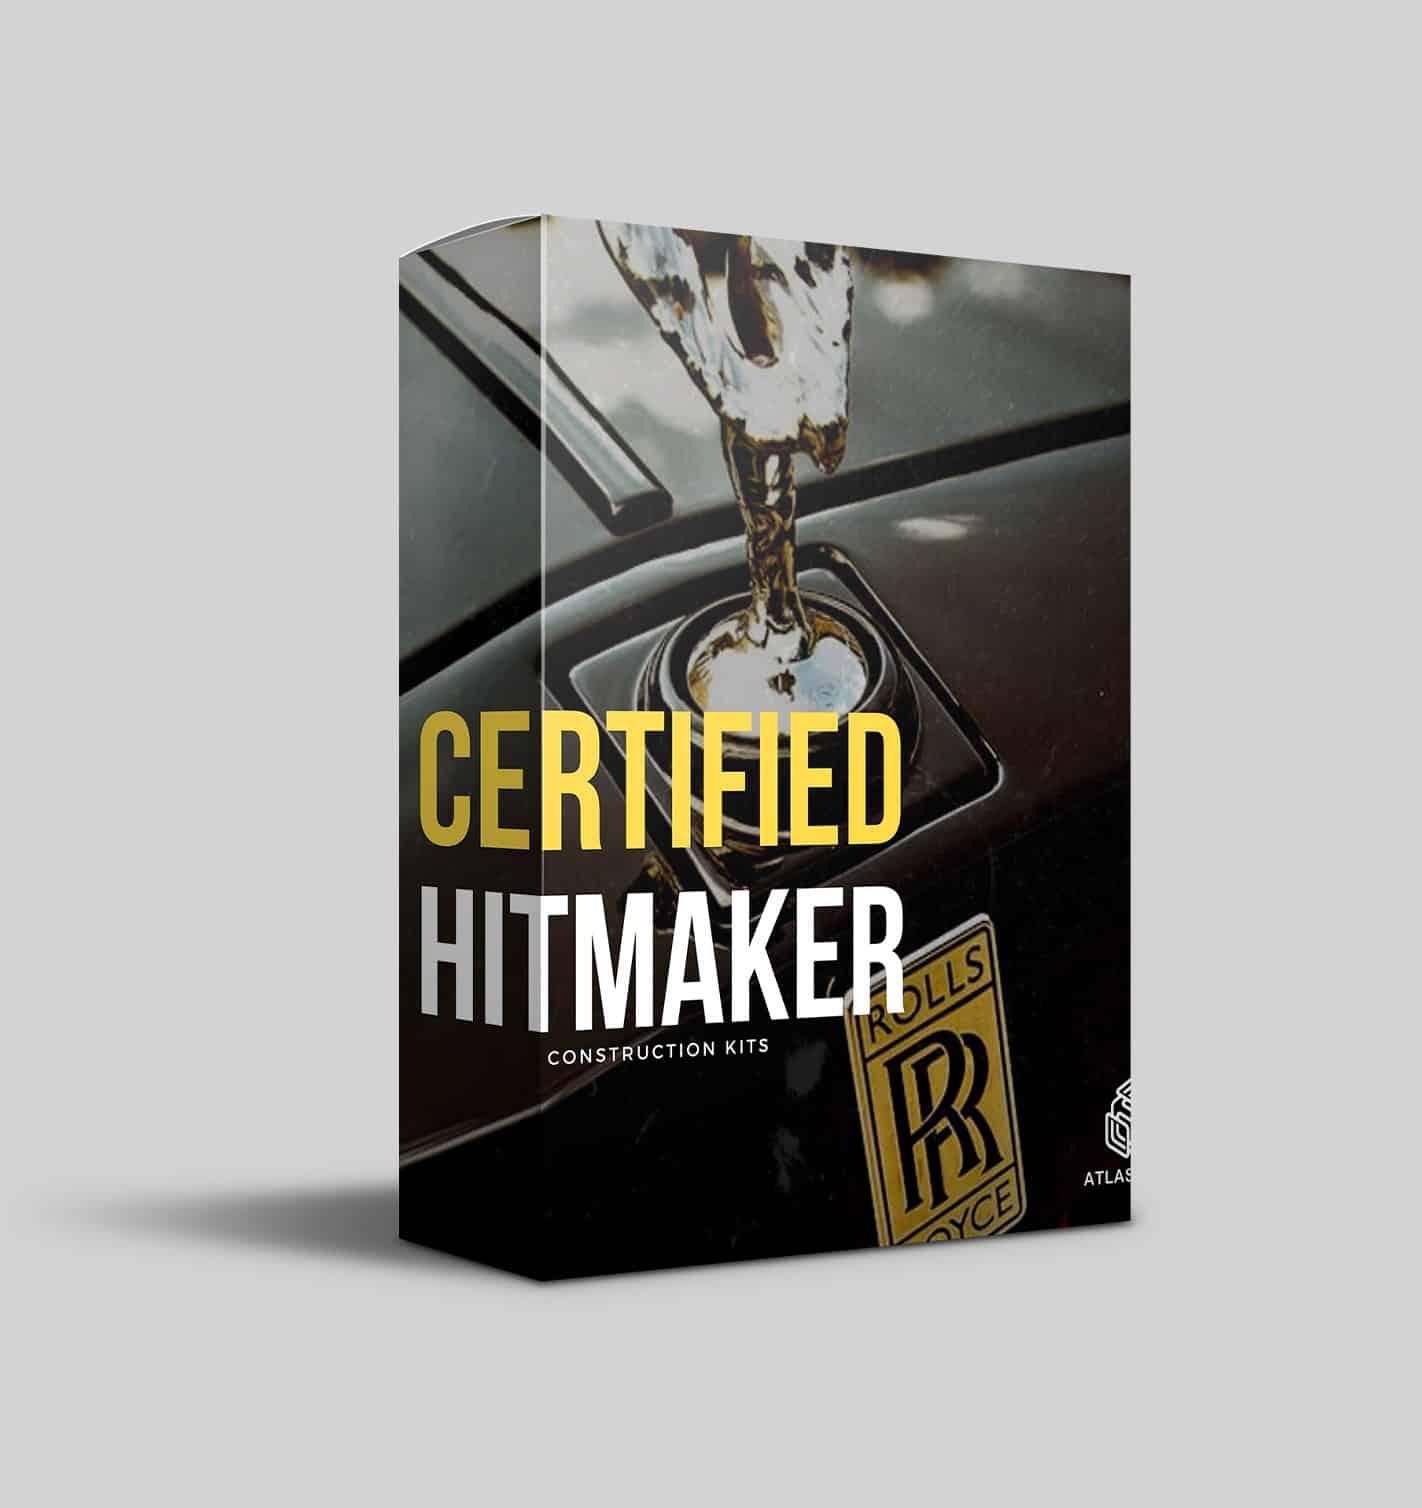 Atlas Audio - Certified Hitmaker (Construction Kit)